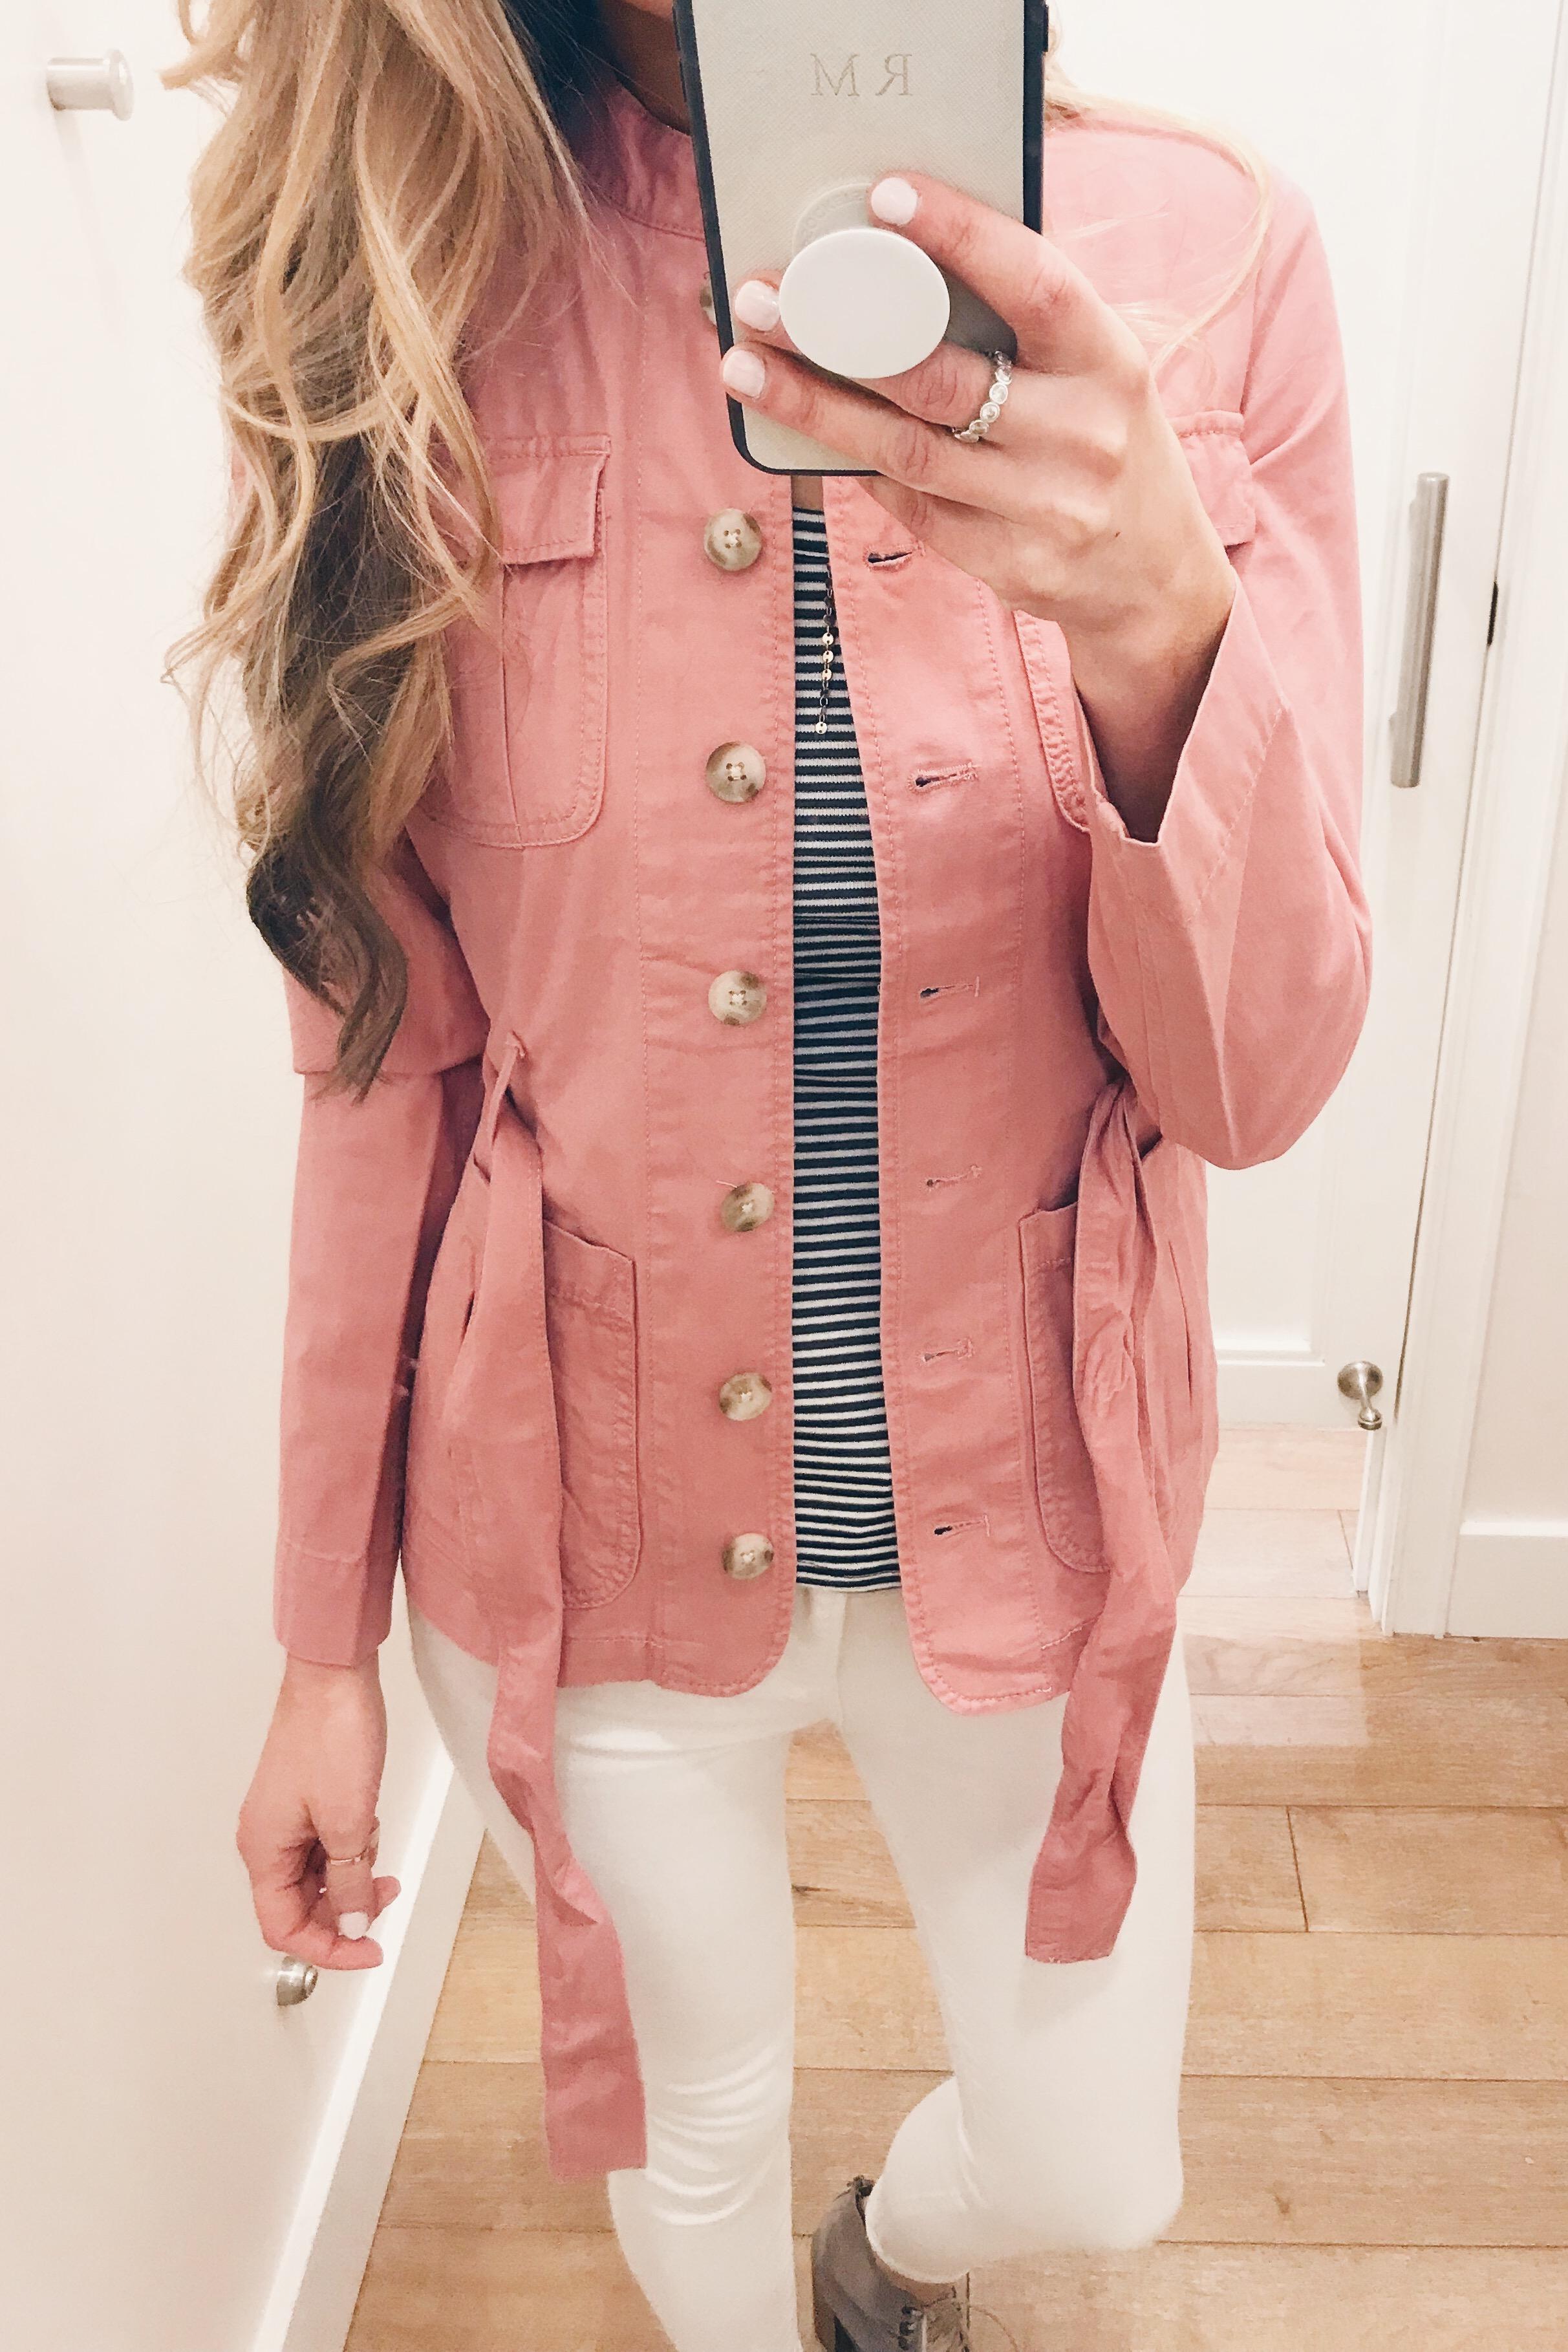 pink spring jacket unbelted on Pinteresting Plans connecticut fashion blog